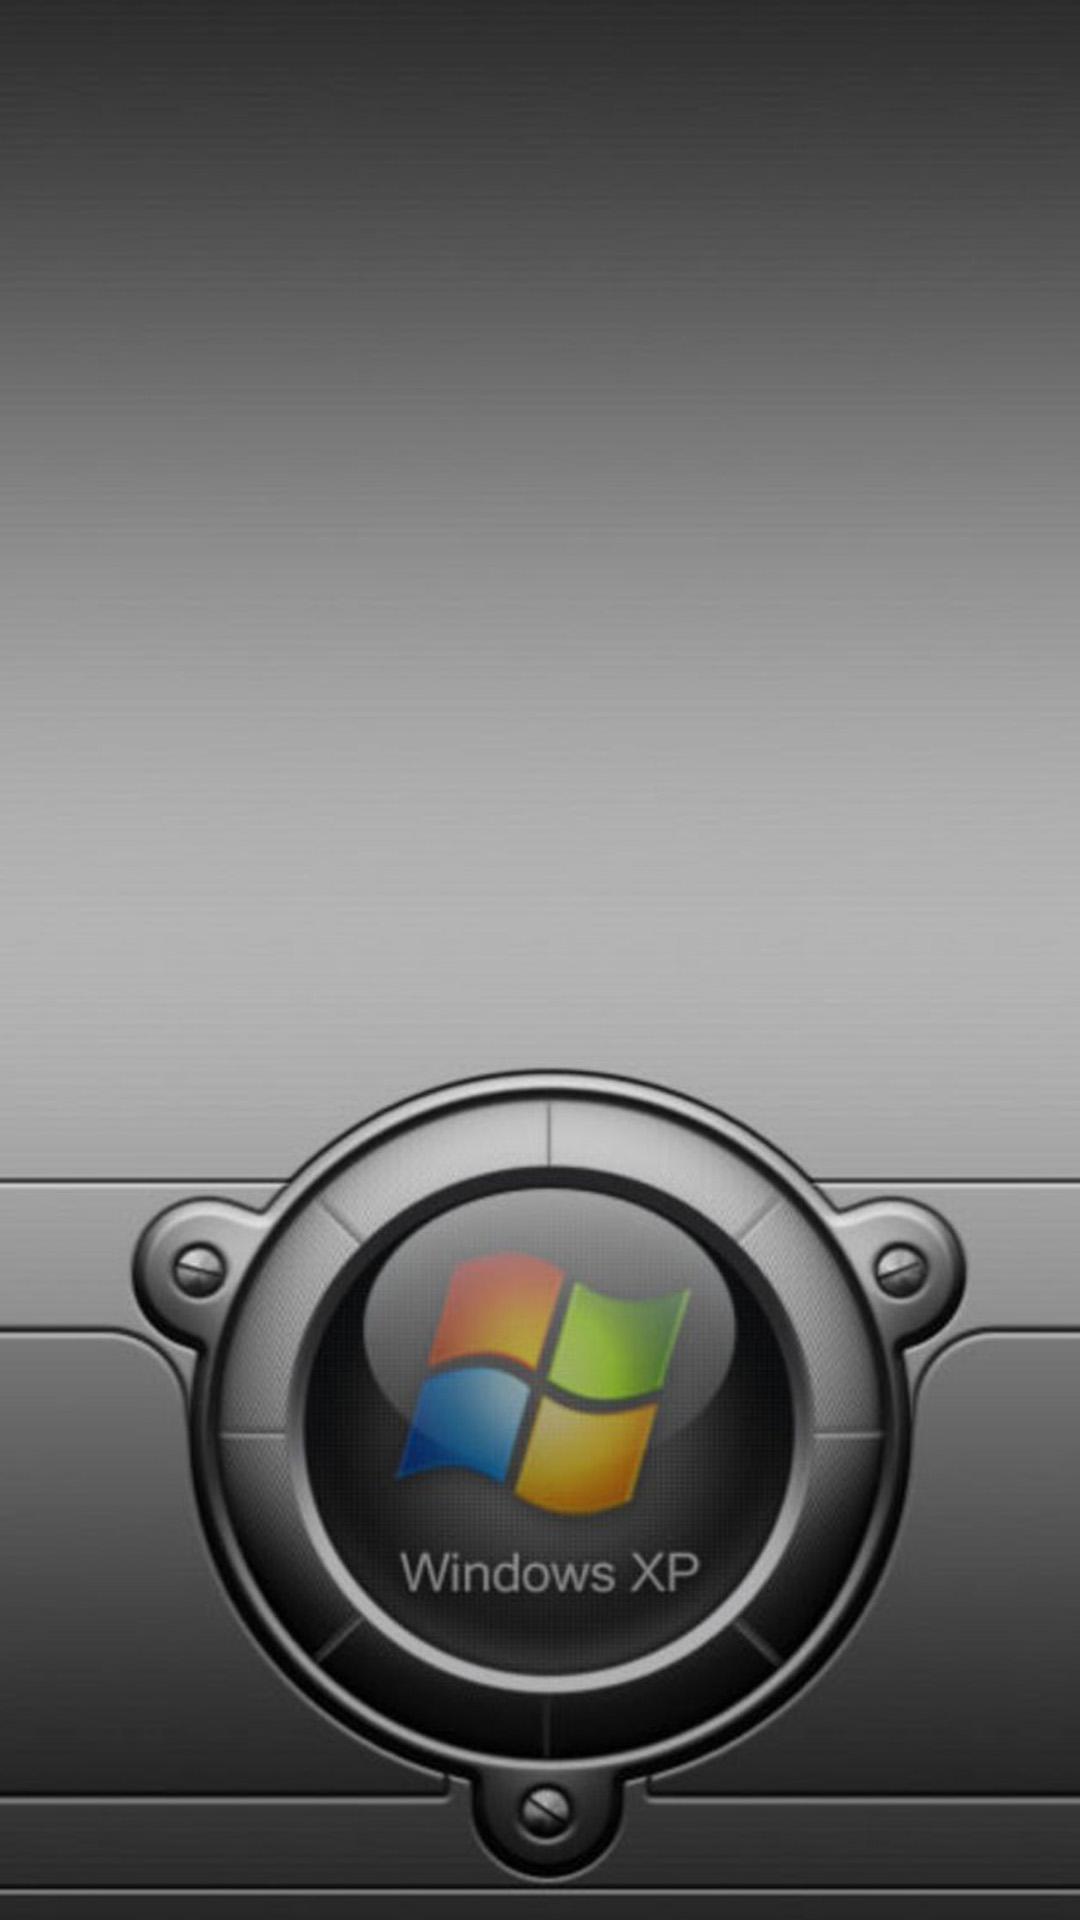 Samsung Galaxy S5 Wallpaper Hd 1080p Windows Xp 1080x1920 Download Hd Wallpaper Wallpapertip